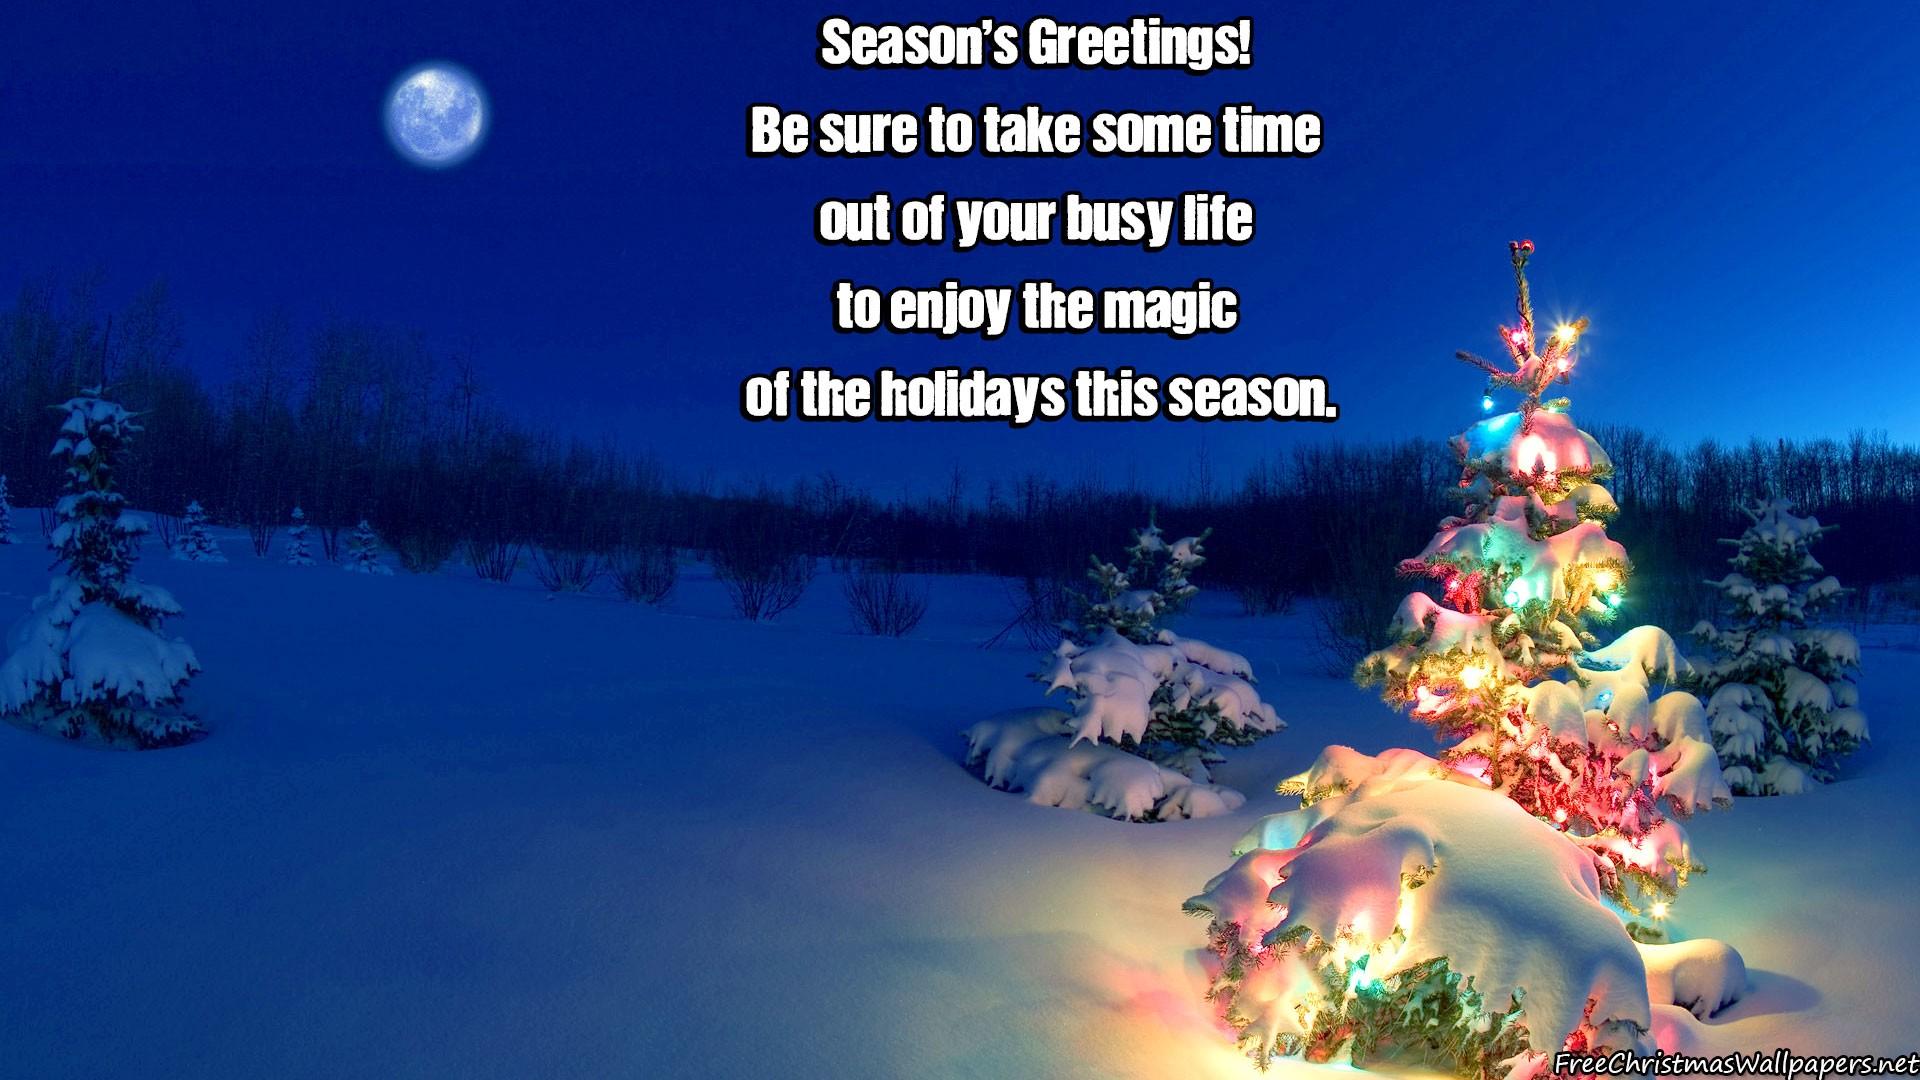 Christmas Seasons Greetings 1920x1080 1080p Wallpaper